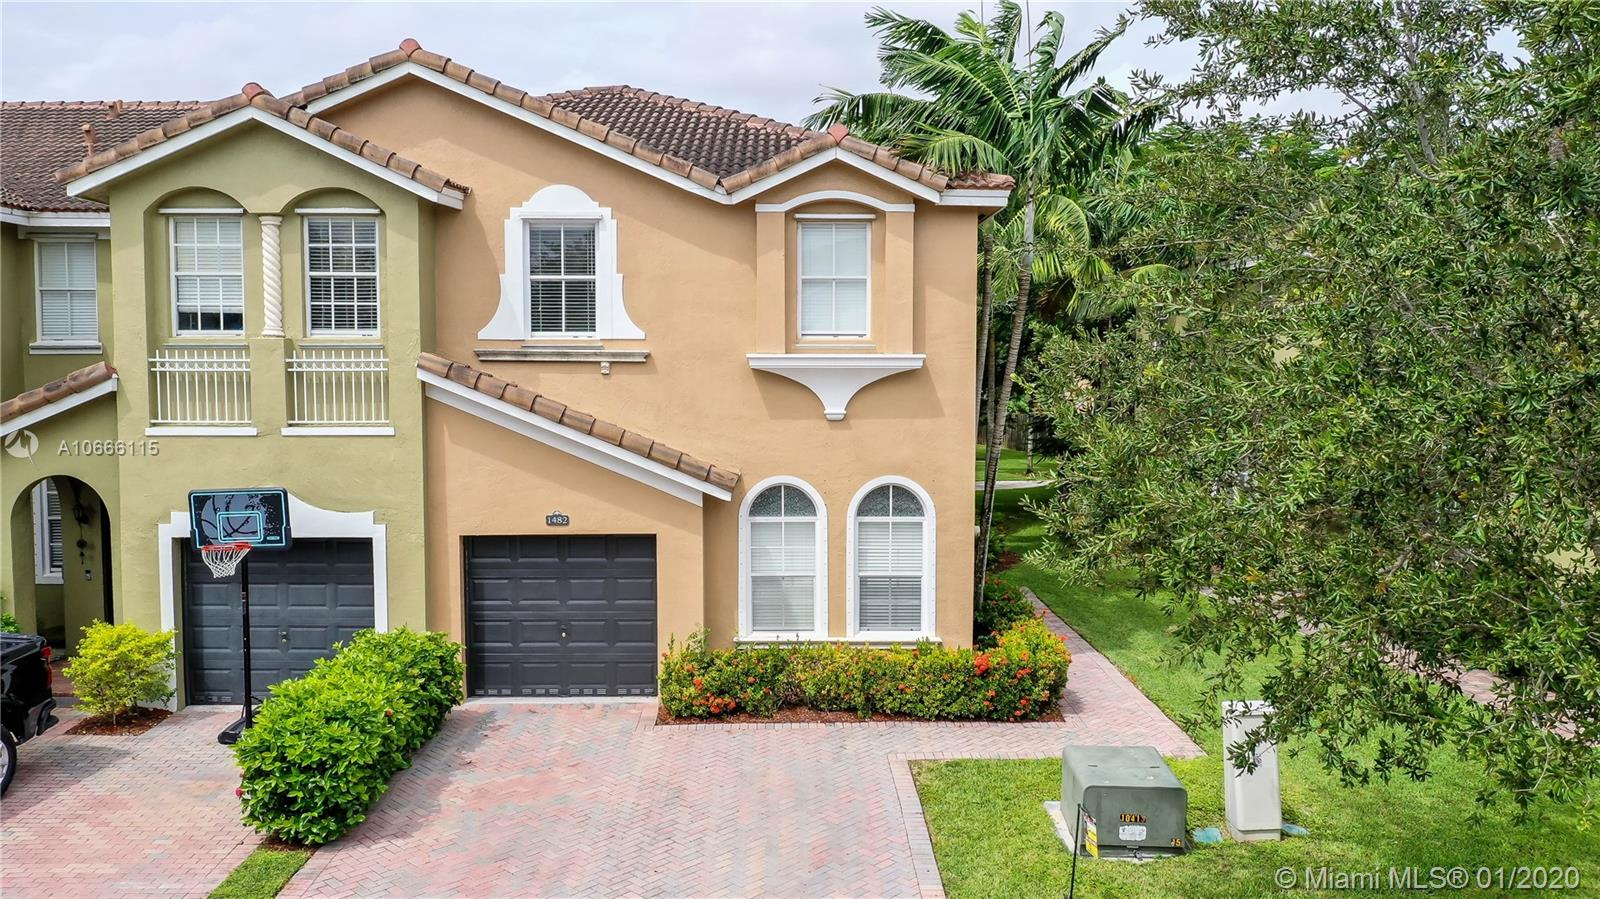 1482 SE 25 Ave, Homestead, FL 33035 - Homestead, FL real estate listing